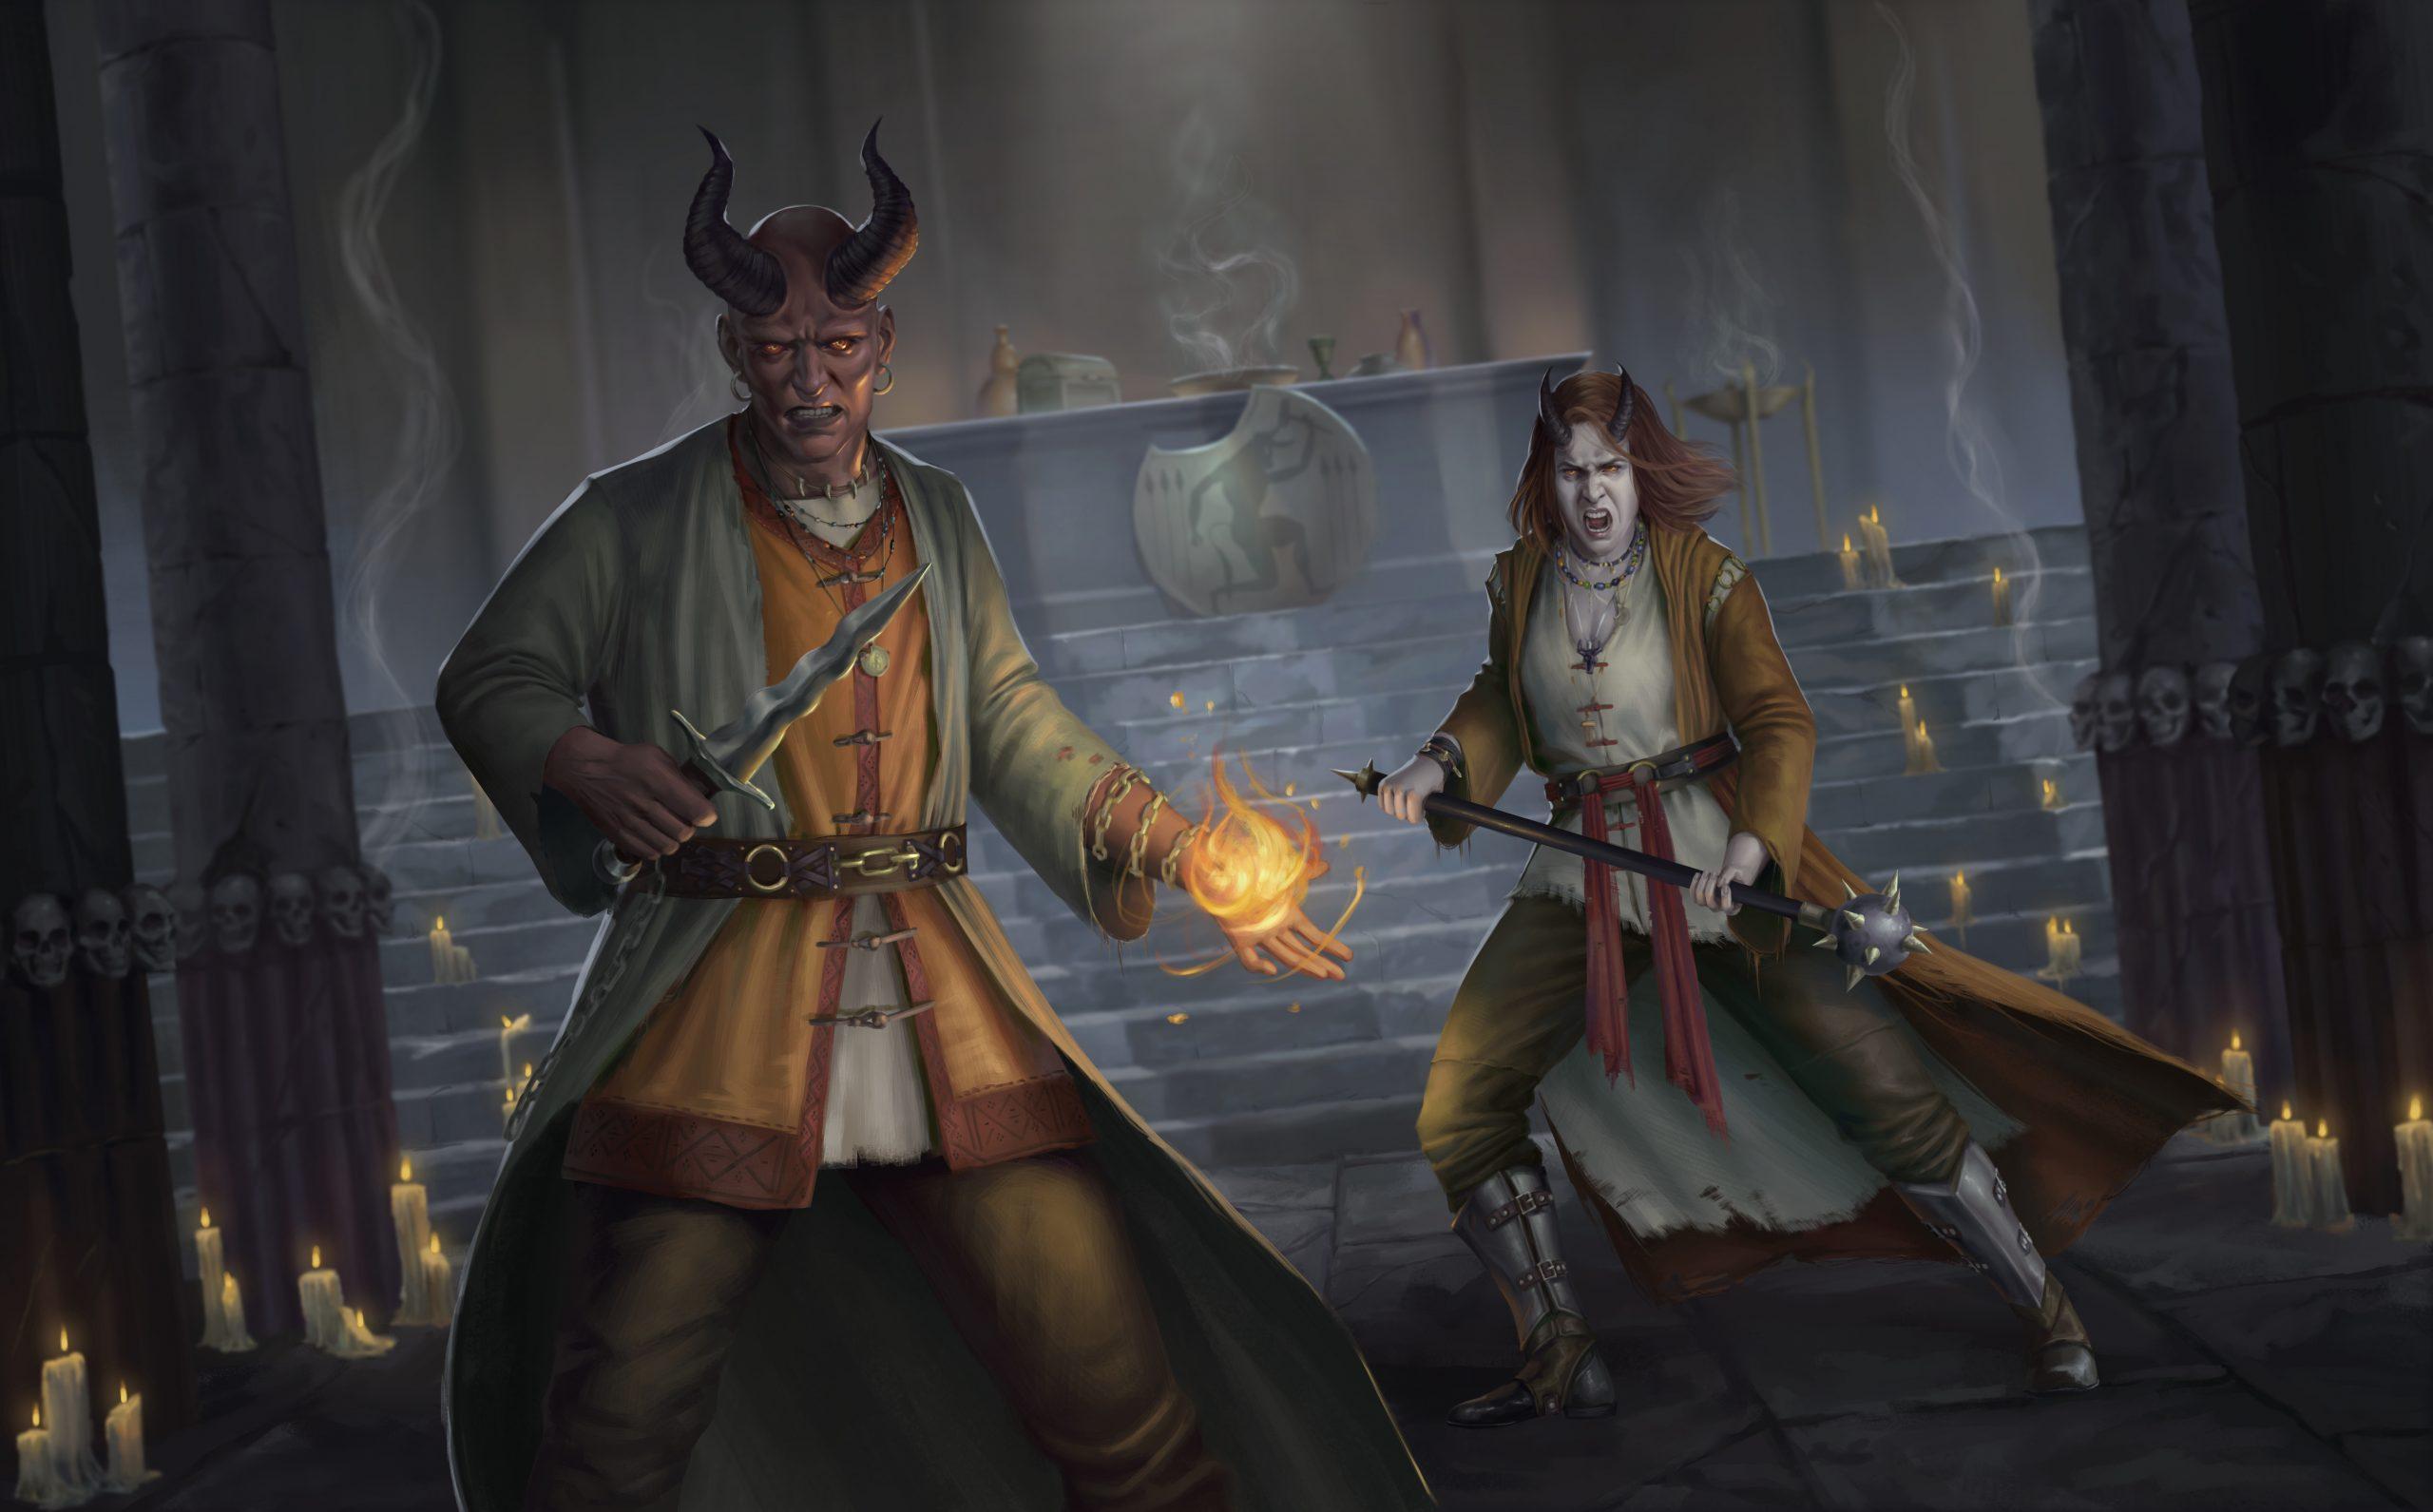 Tiefling Cultists cast magic